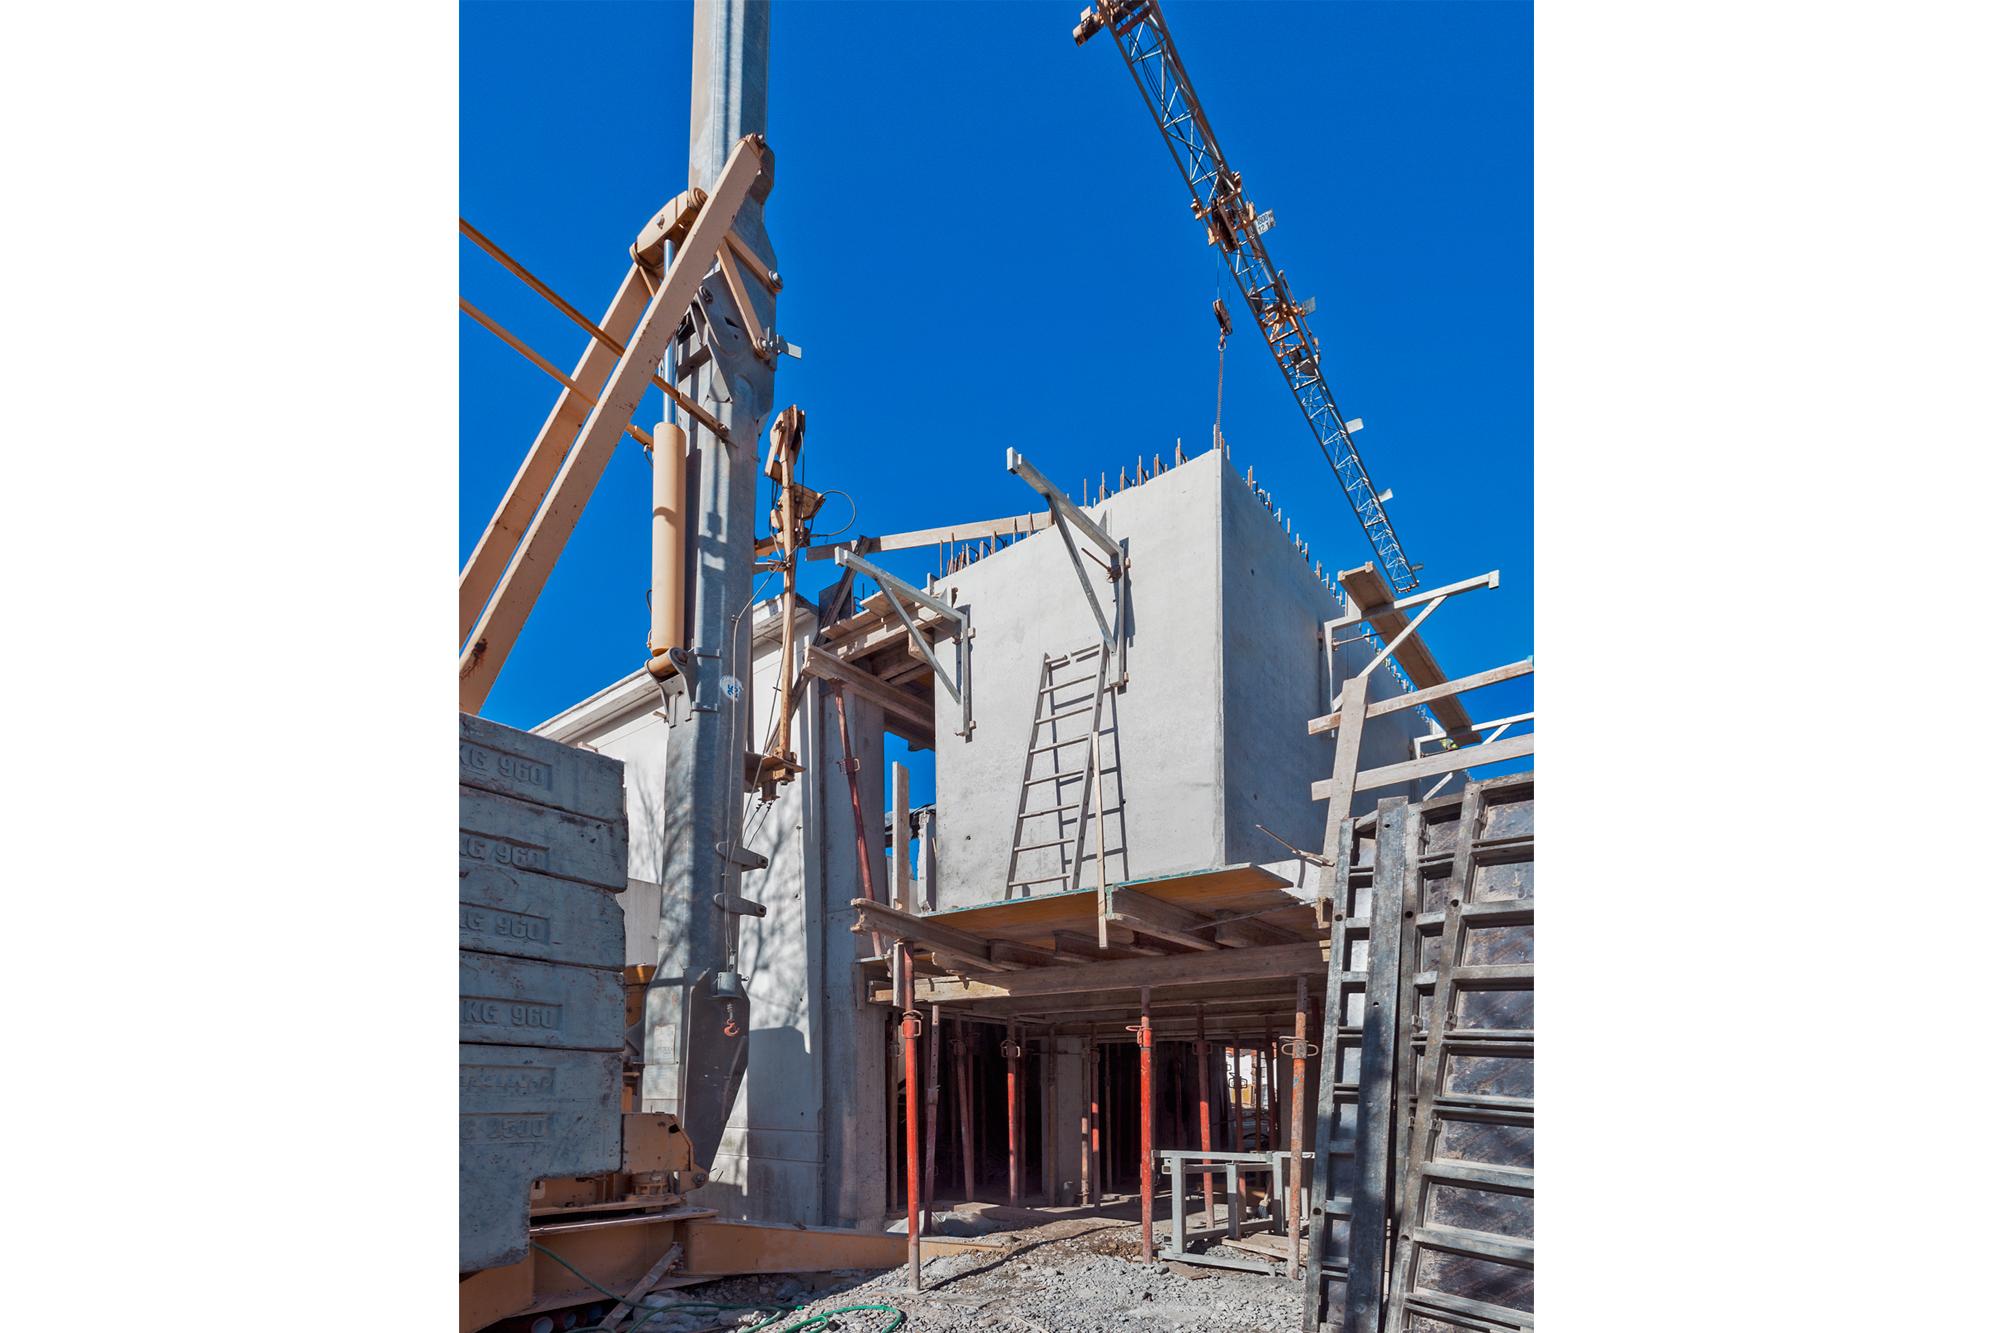 antunes guimarães 1003 house, construction phase, 2017